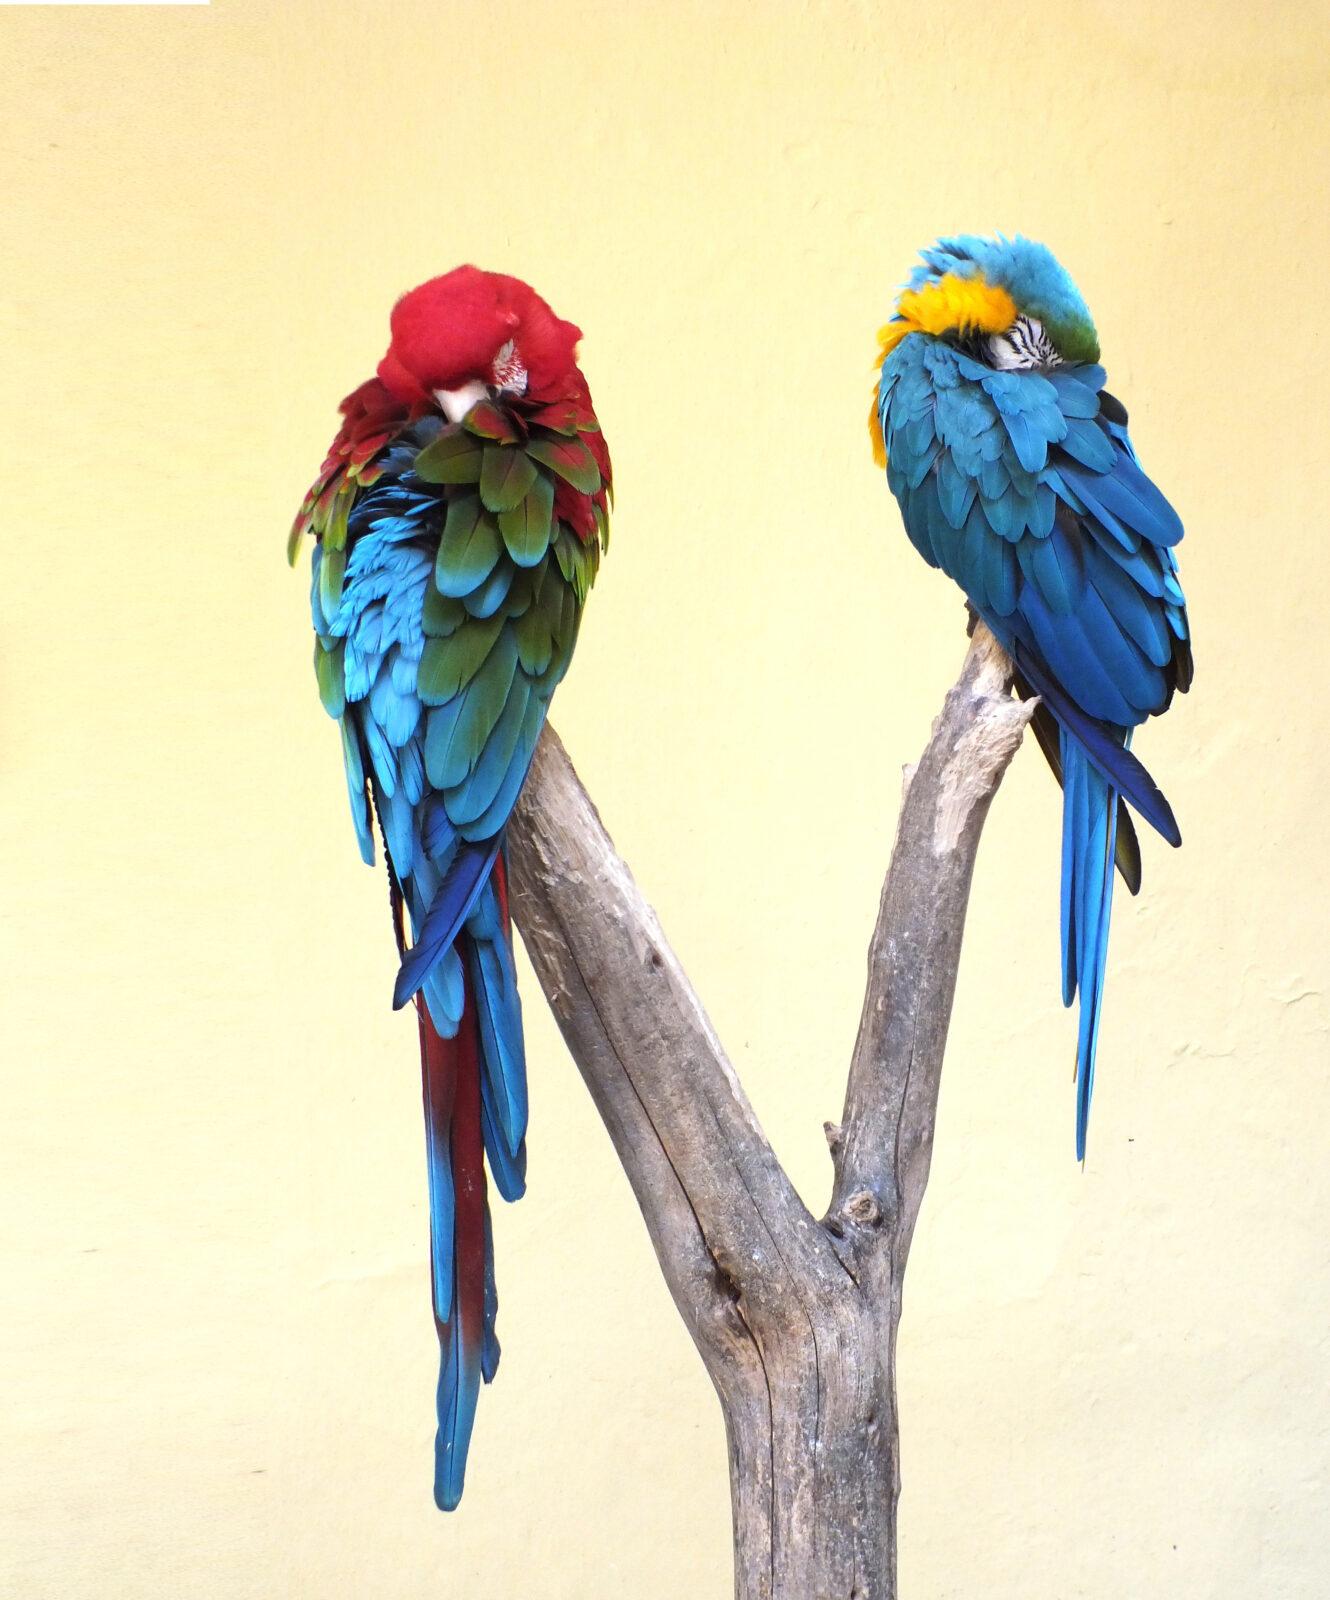 Puu otsas magavad papagoid.